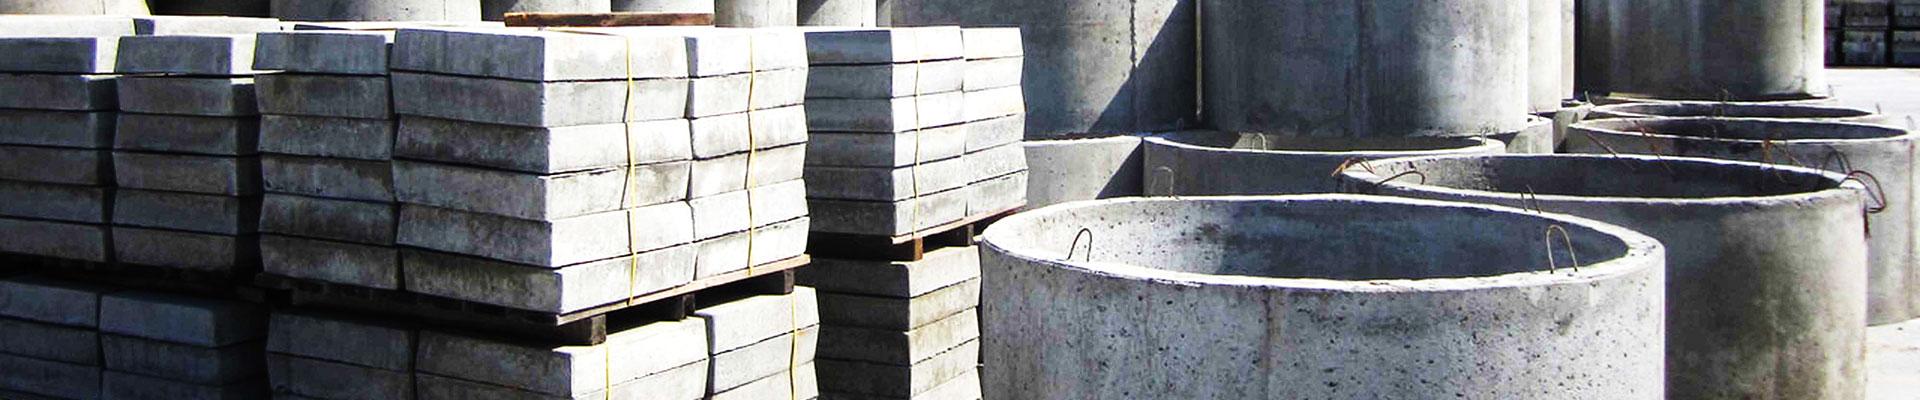 Купить бетон волгоградская область ту фибробетон